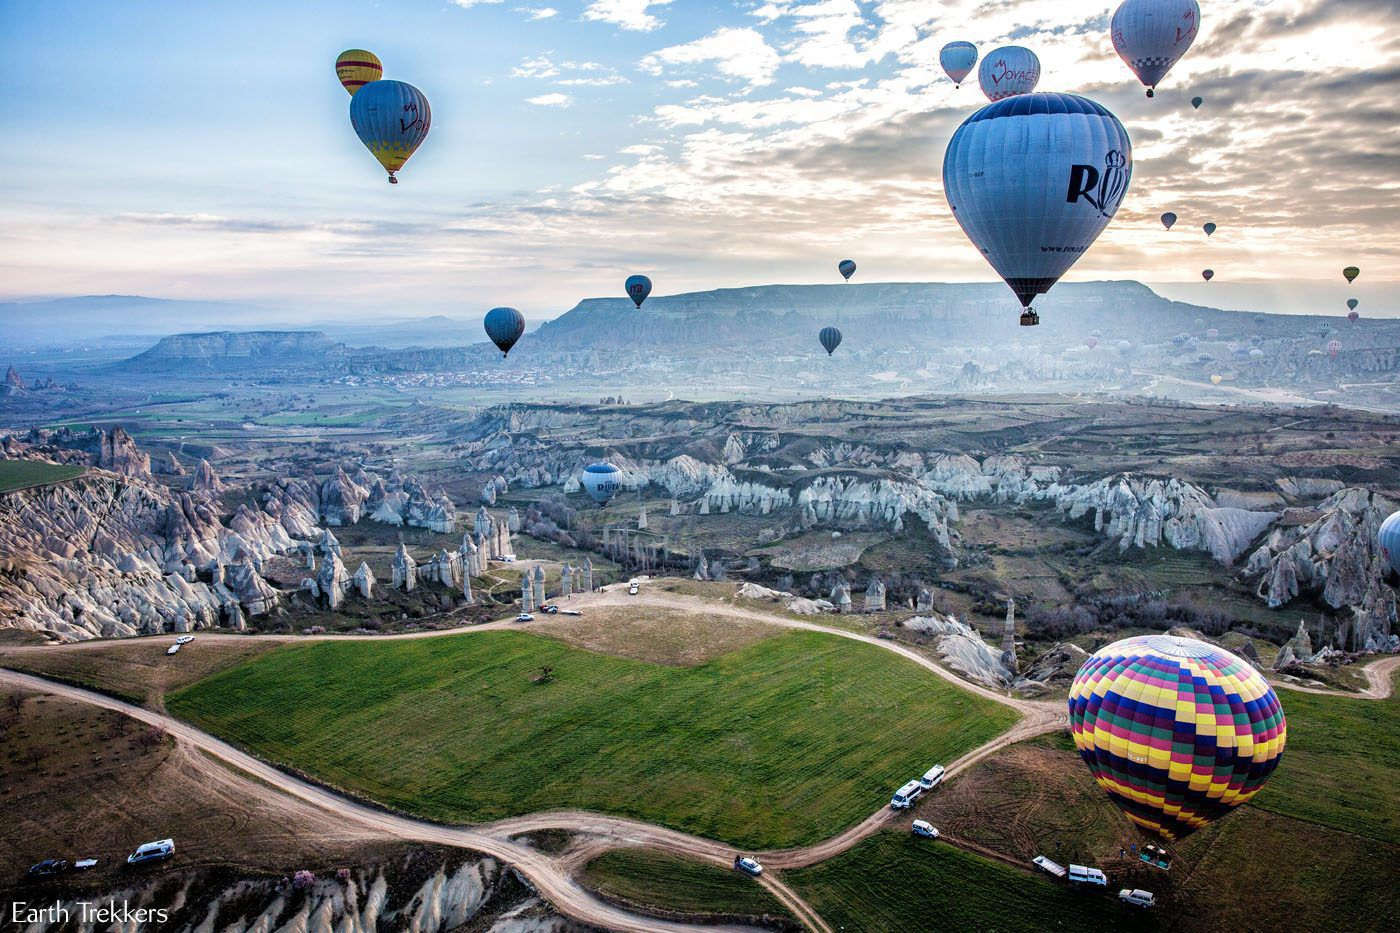 Cappadocia balloons Fairytale Destinations